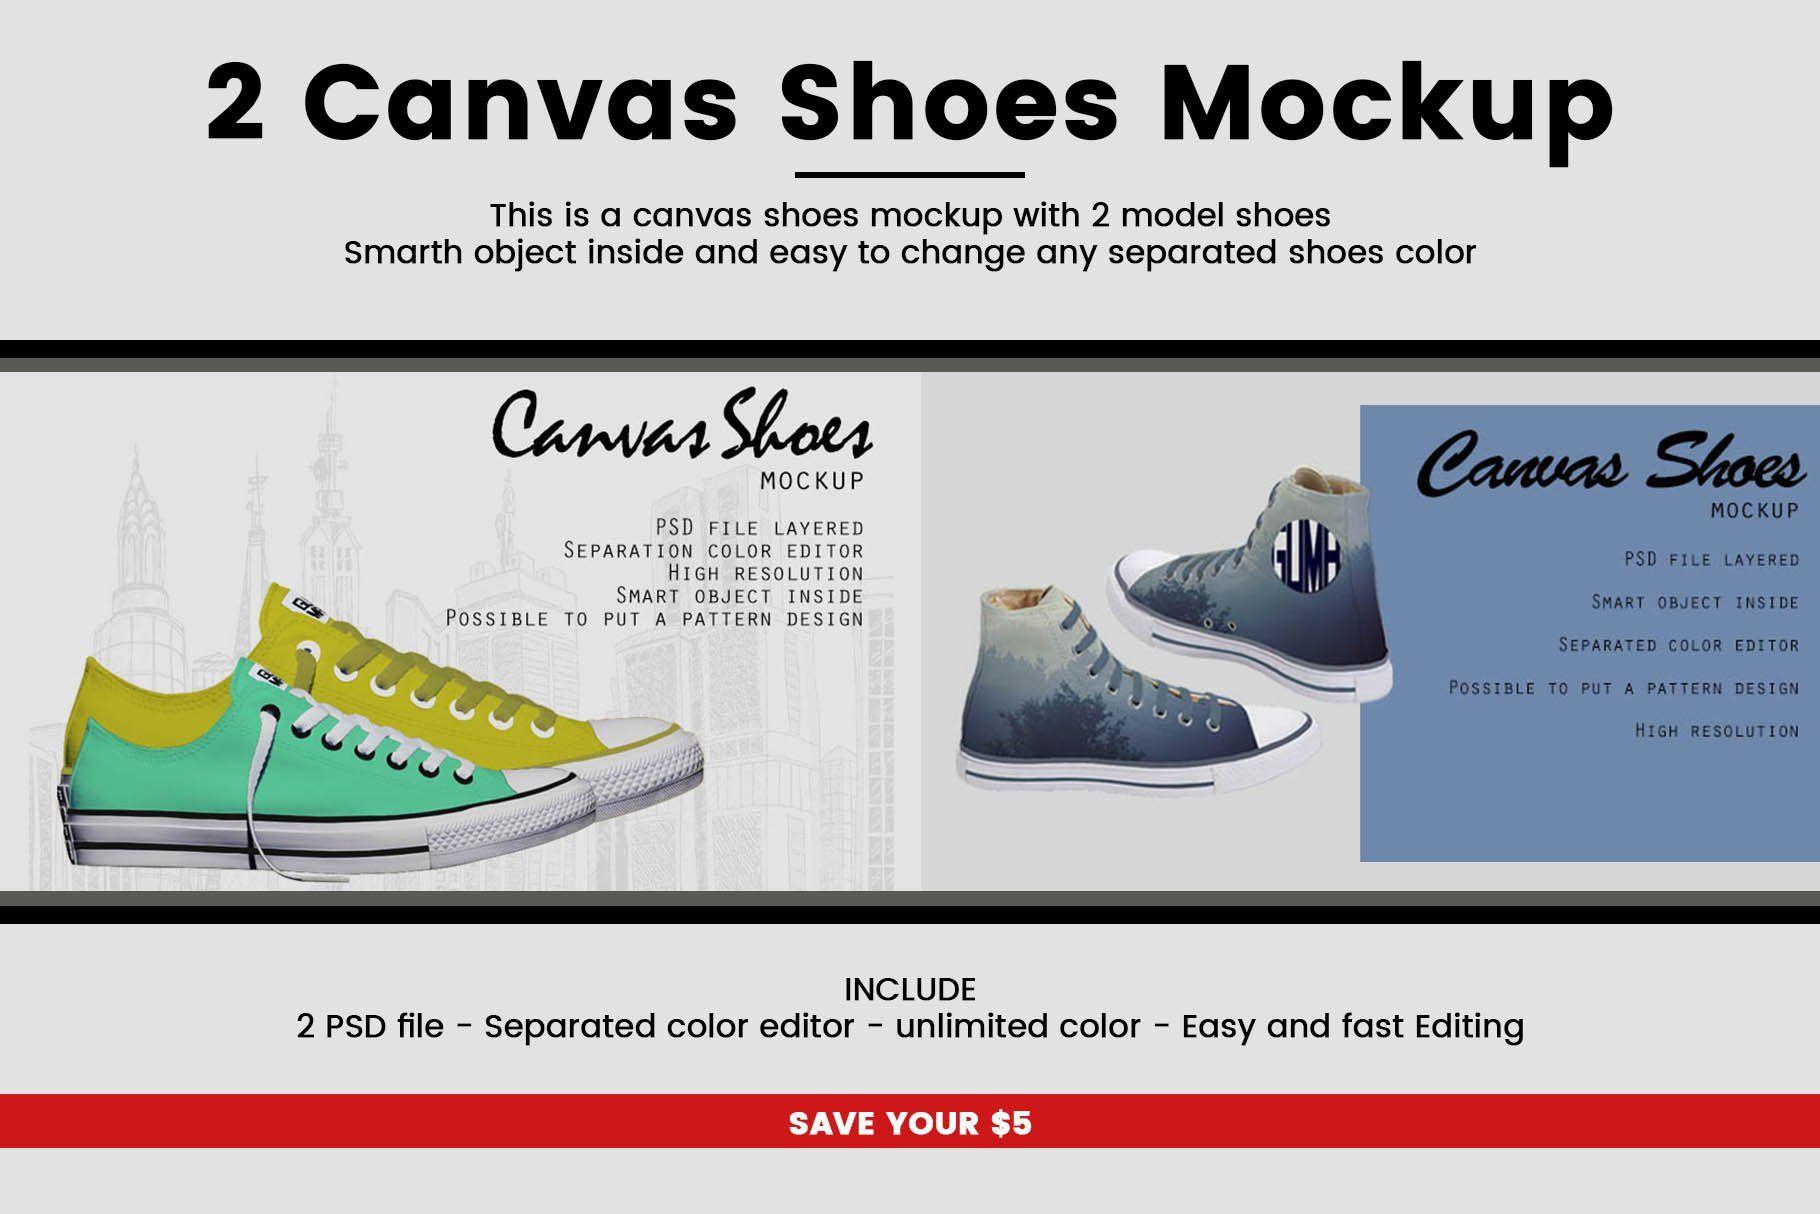 Download 2 Canvas Shoes Mockup Sponsored Design Product Show Perfect Ad Design Mockup Free Mockup Mockup Psd